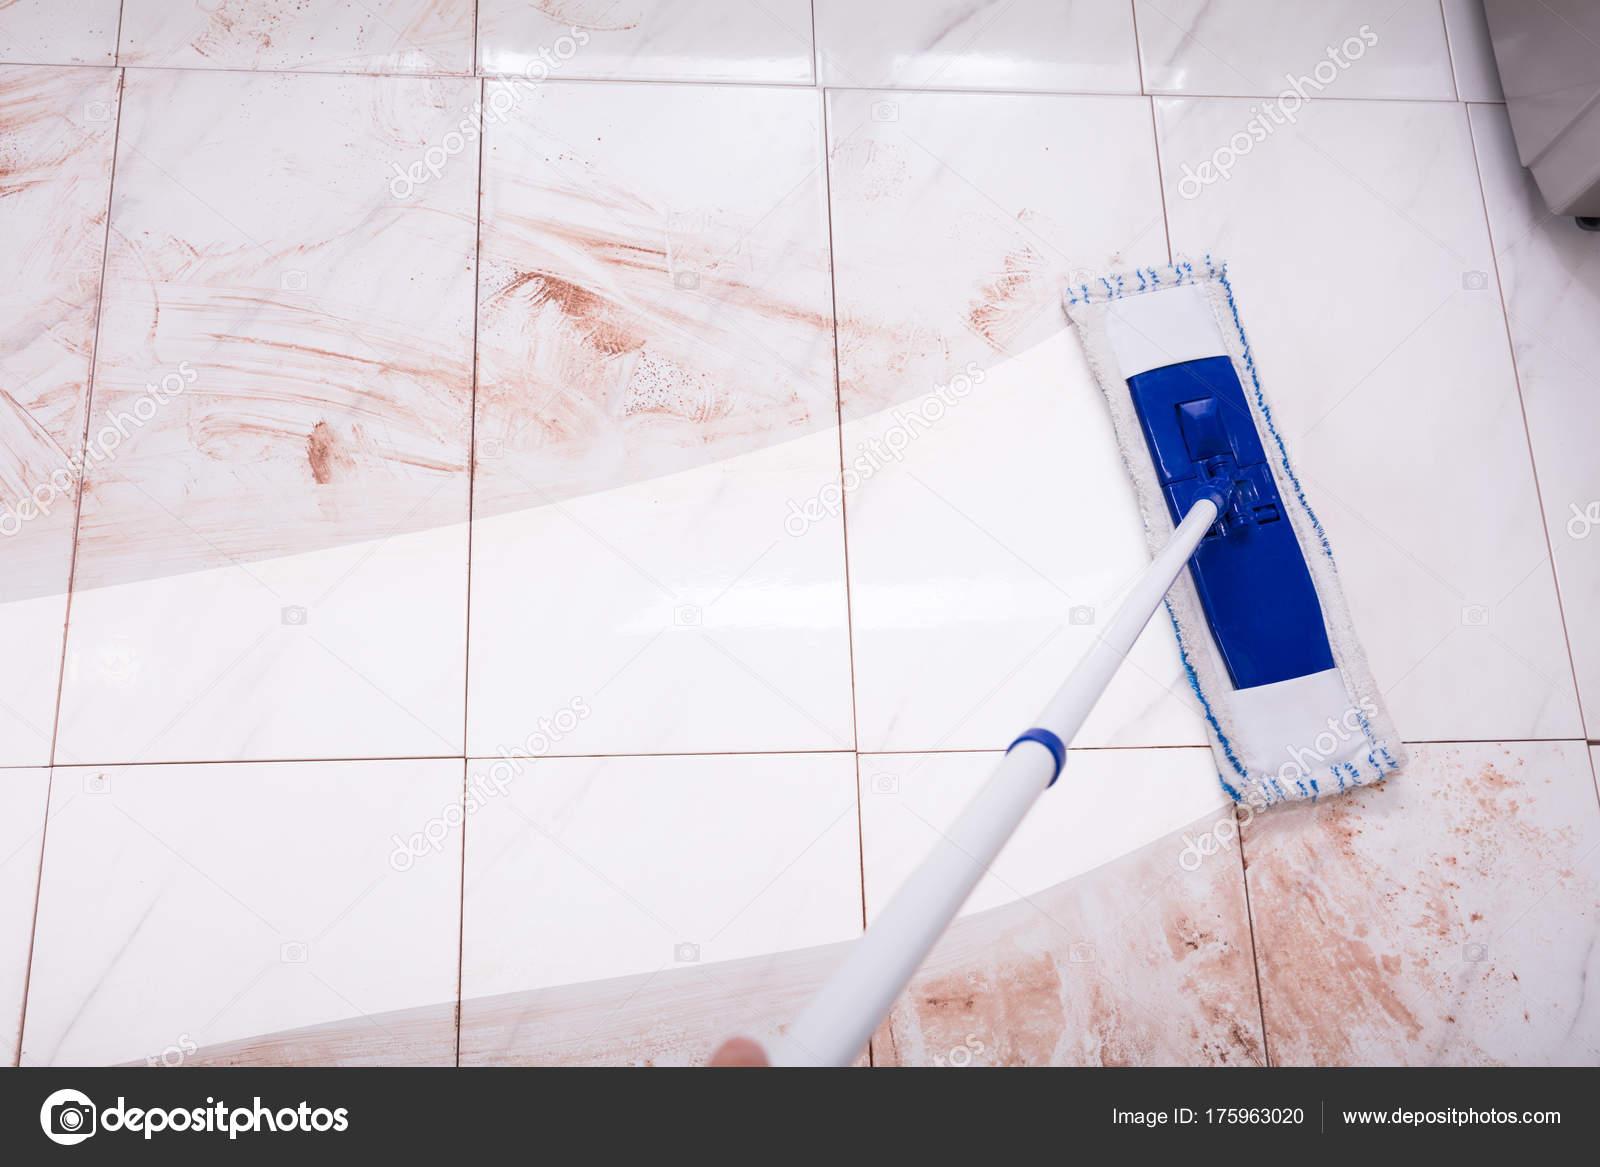 cleaning kitchen floors glass cabinet 拖把清洁厨房地板 图库照片 c andreypopov 175963020